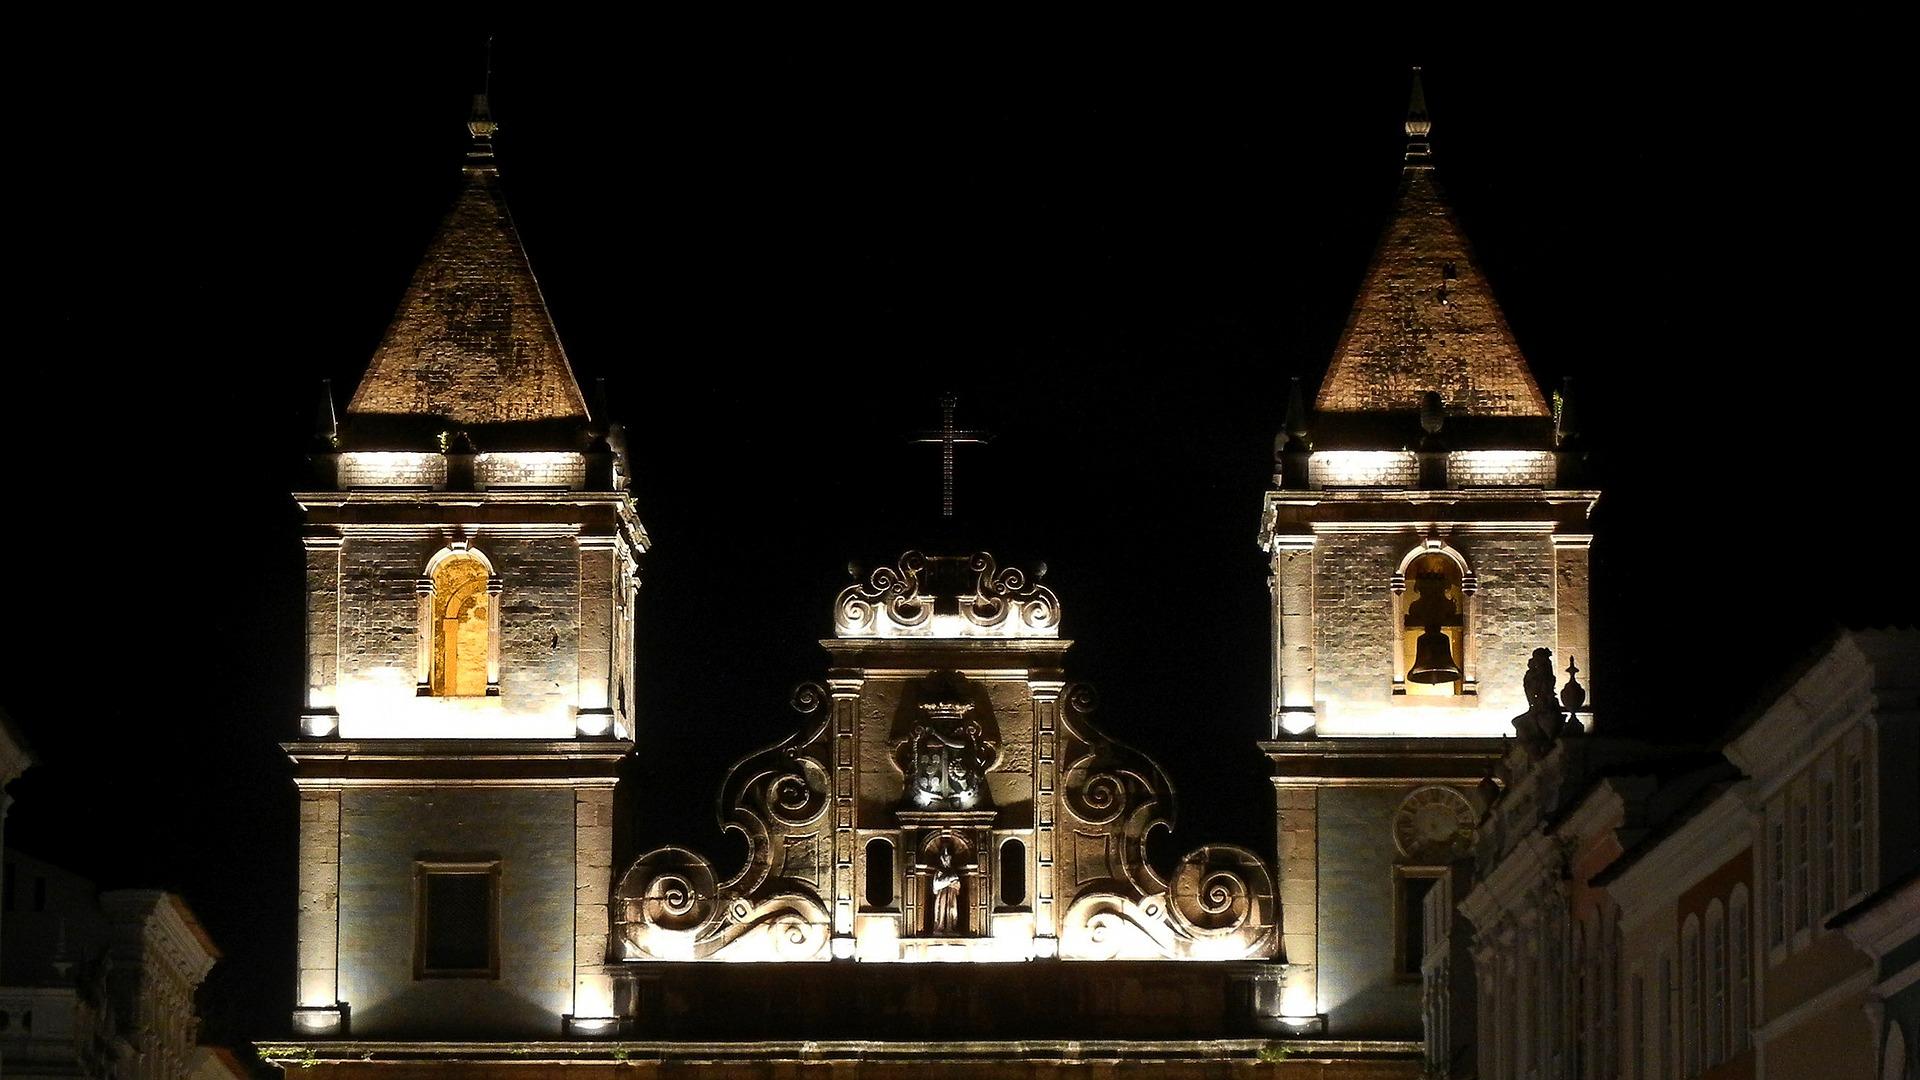 Church | Architecture in Salvador da Bahia